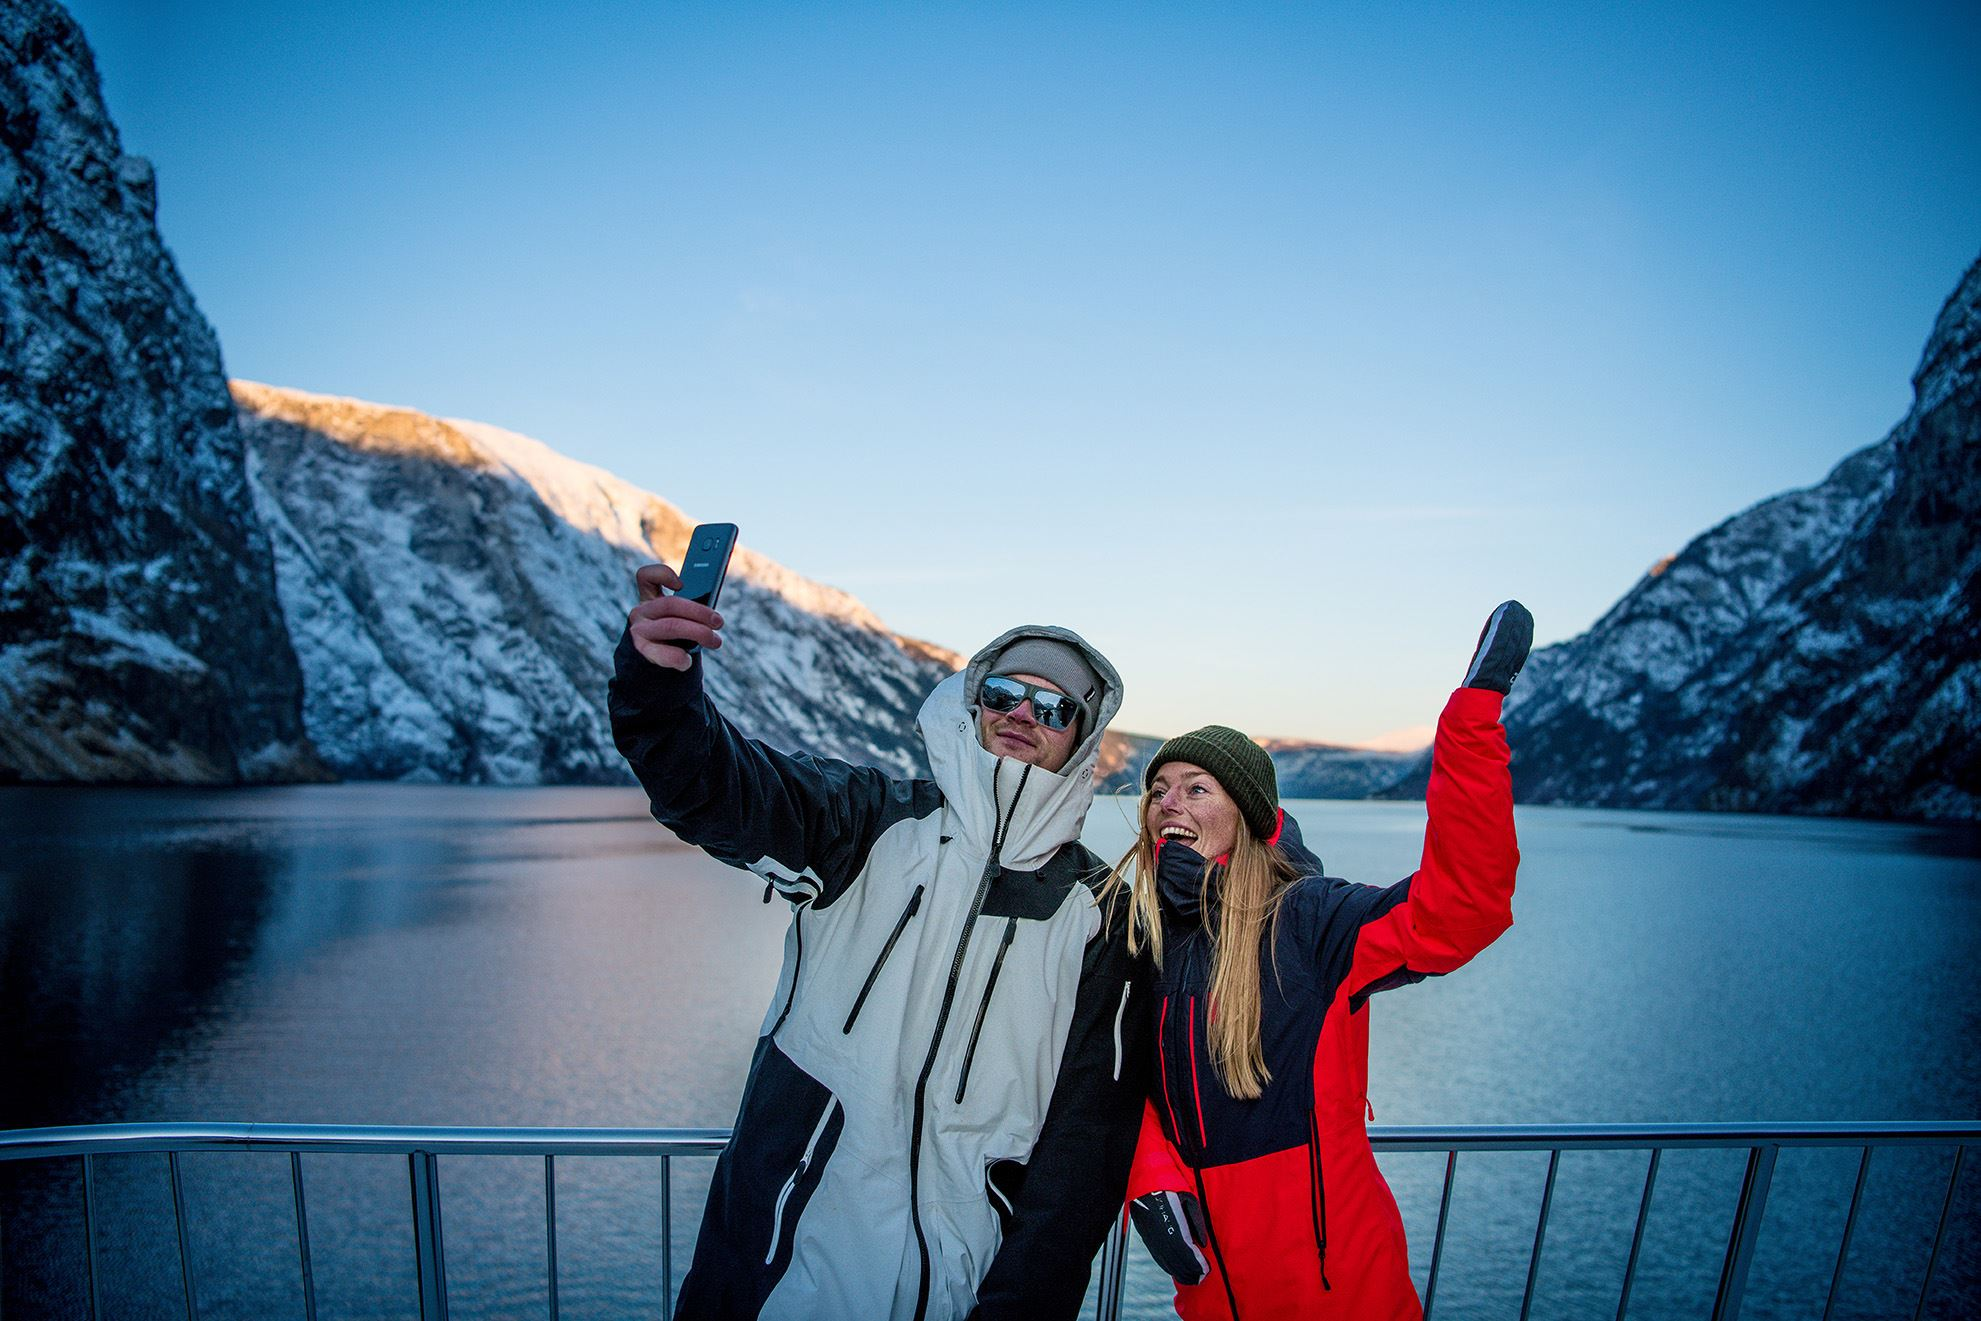 Sverre Hjørnevik, New Years Eve Cruise 2018